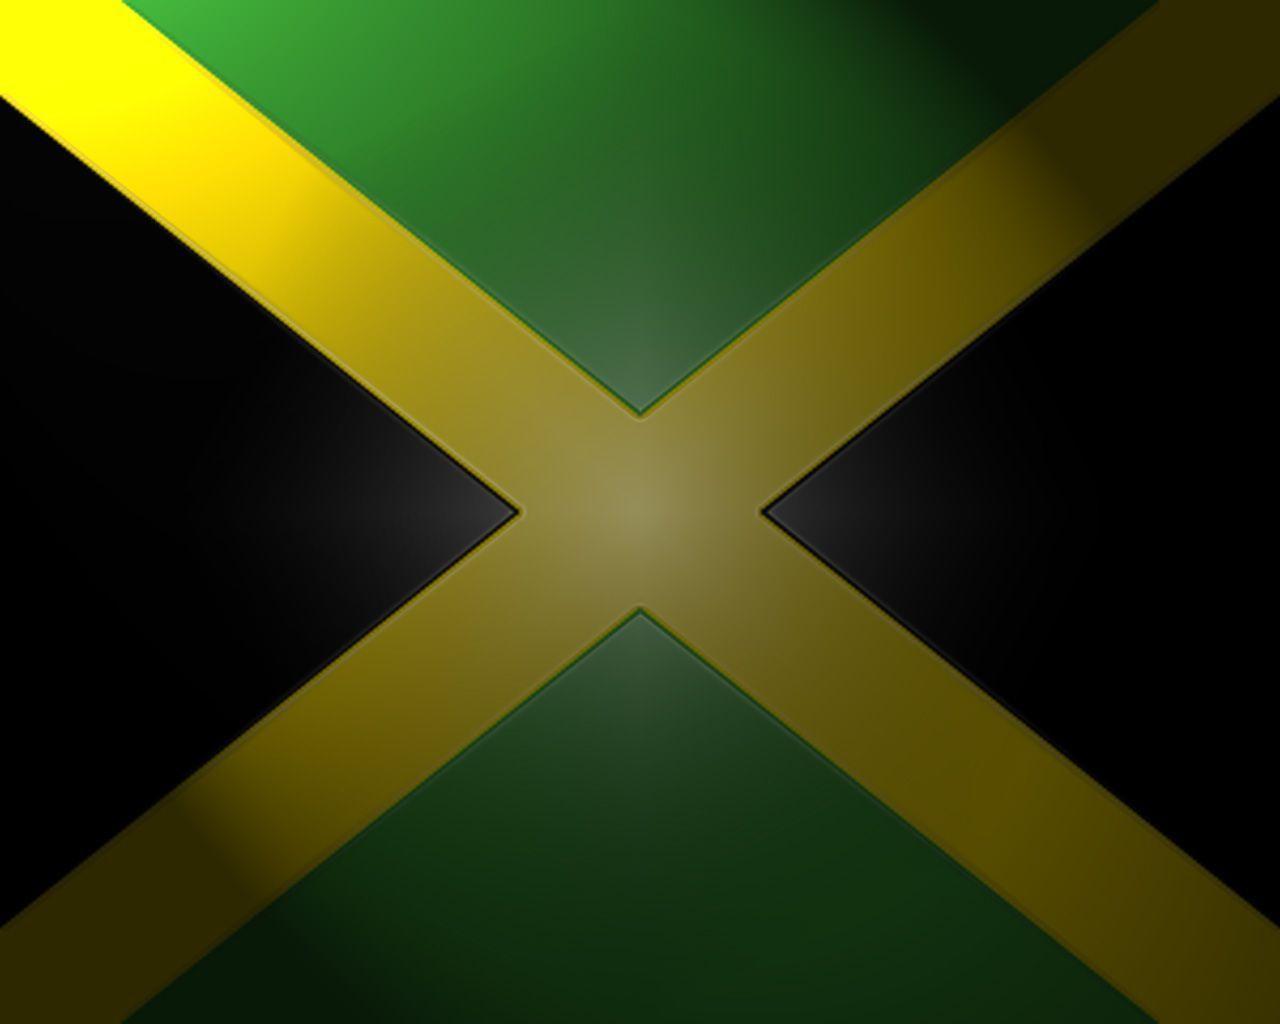 Jamaican Wallpaper : Wallpaper Wallpapers Jamaica Desktopia ...